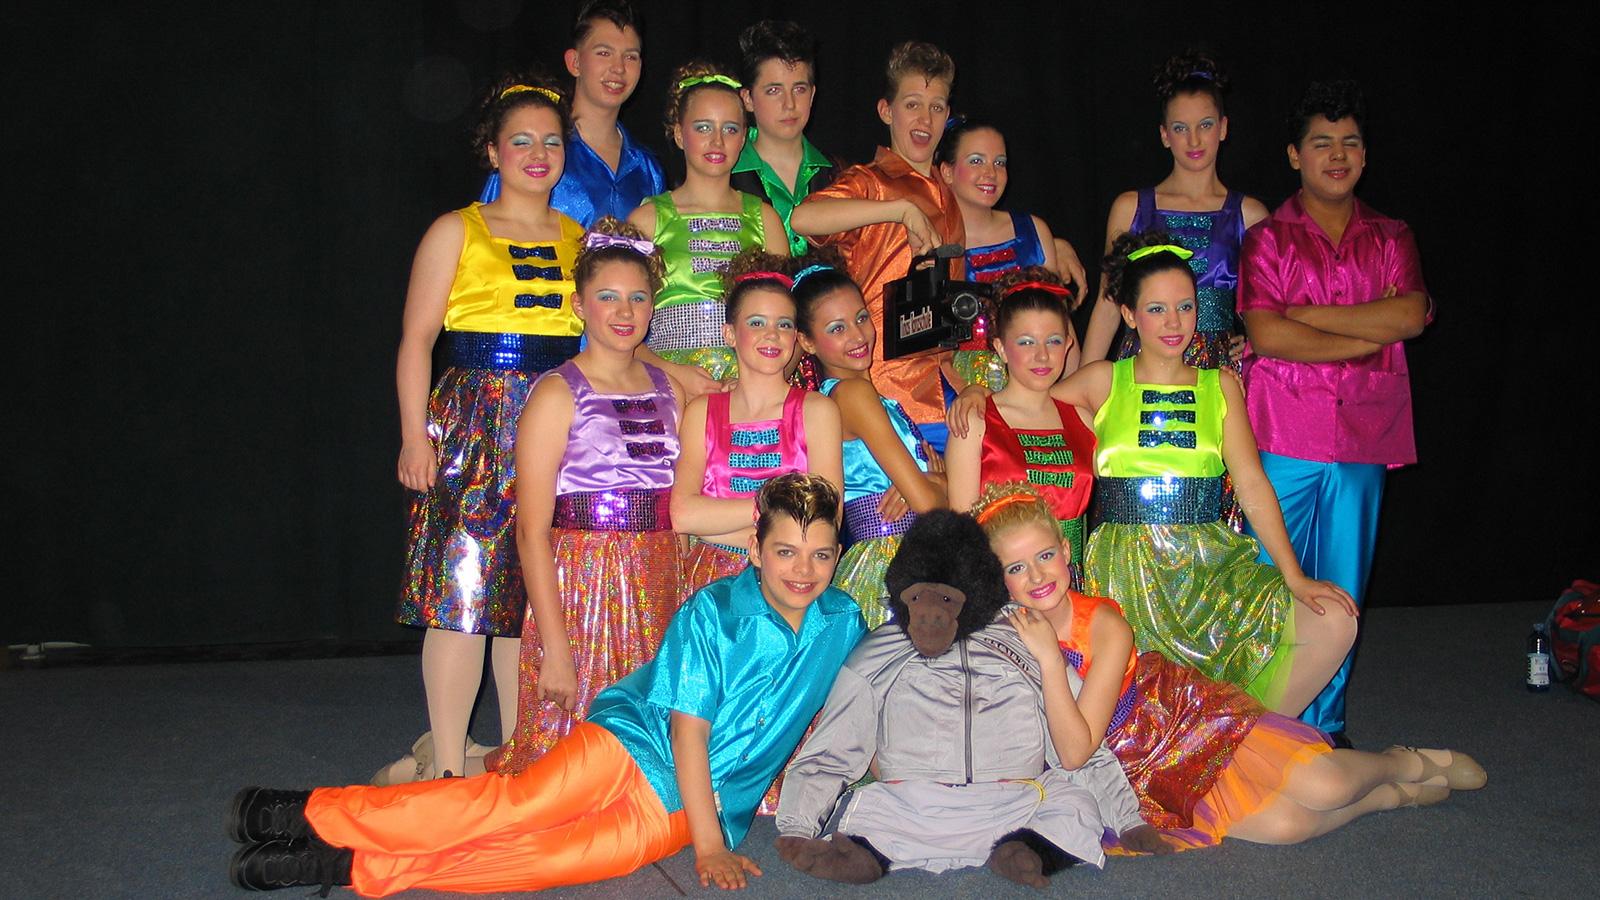 Nicest Kids in Town • Song & Dance Europameister, European Open 2004